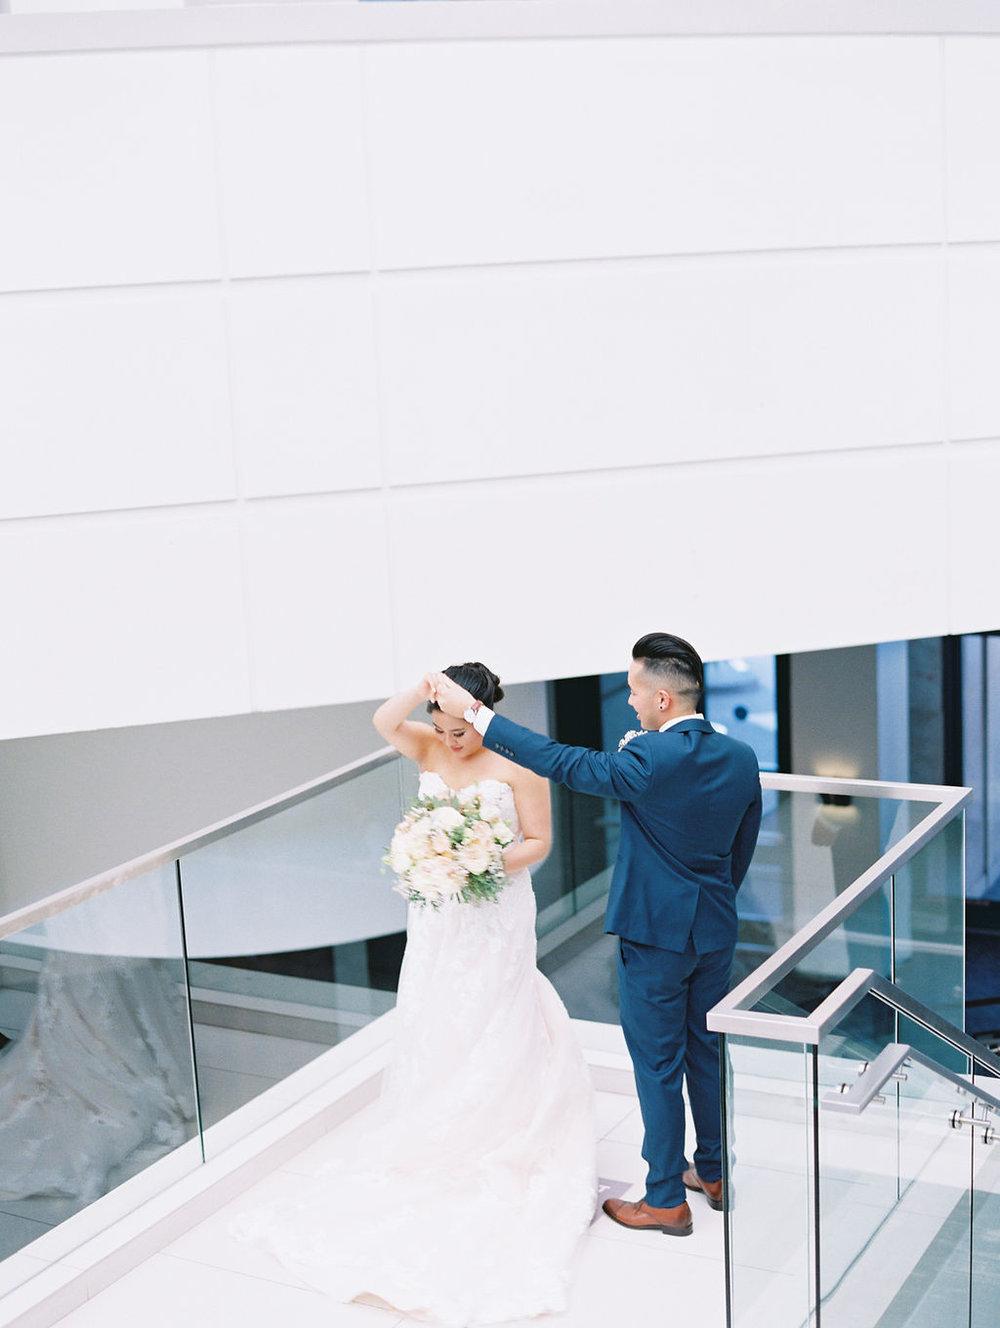 JennySoiPhotography-S&SSFAirportWeddingBrideandGroom-141.jpgSan Francisco Fairmont Hotel Wedding Fine Art Film Wedding Photographer